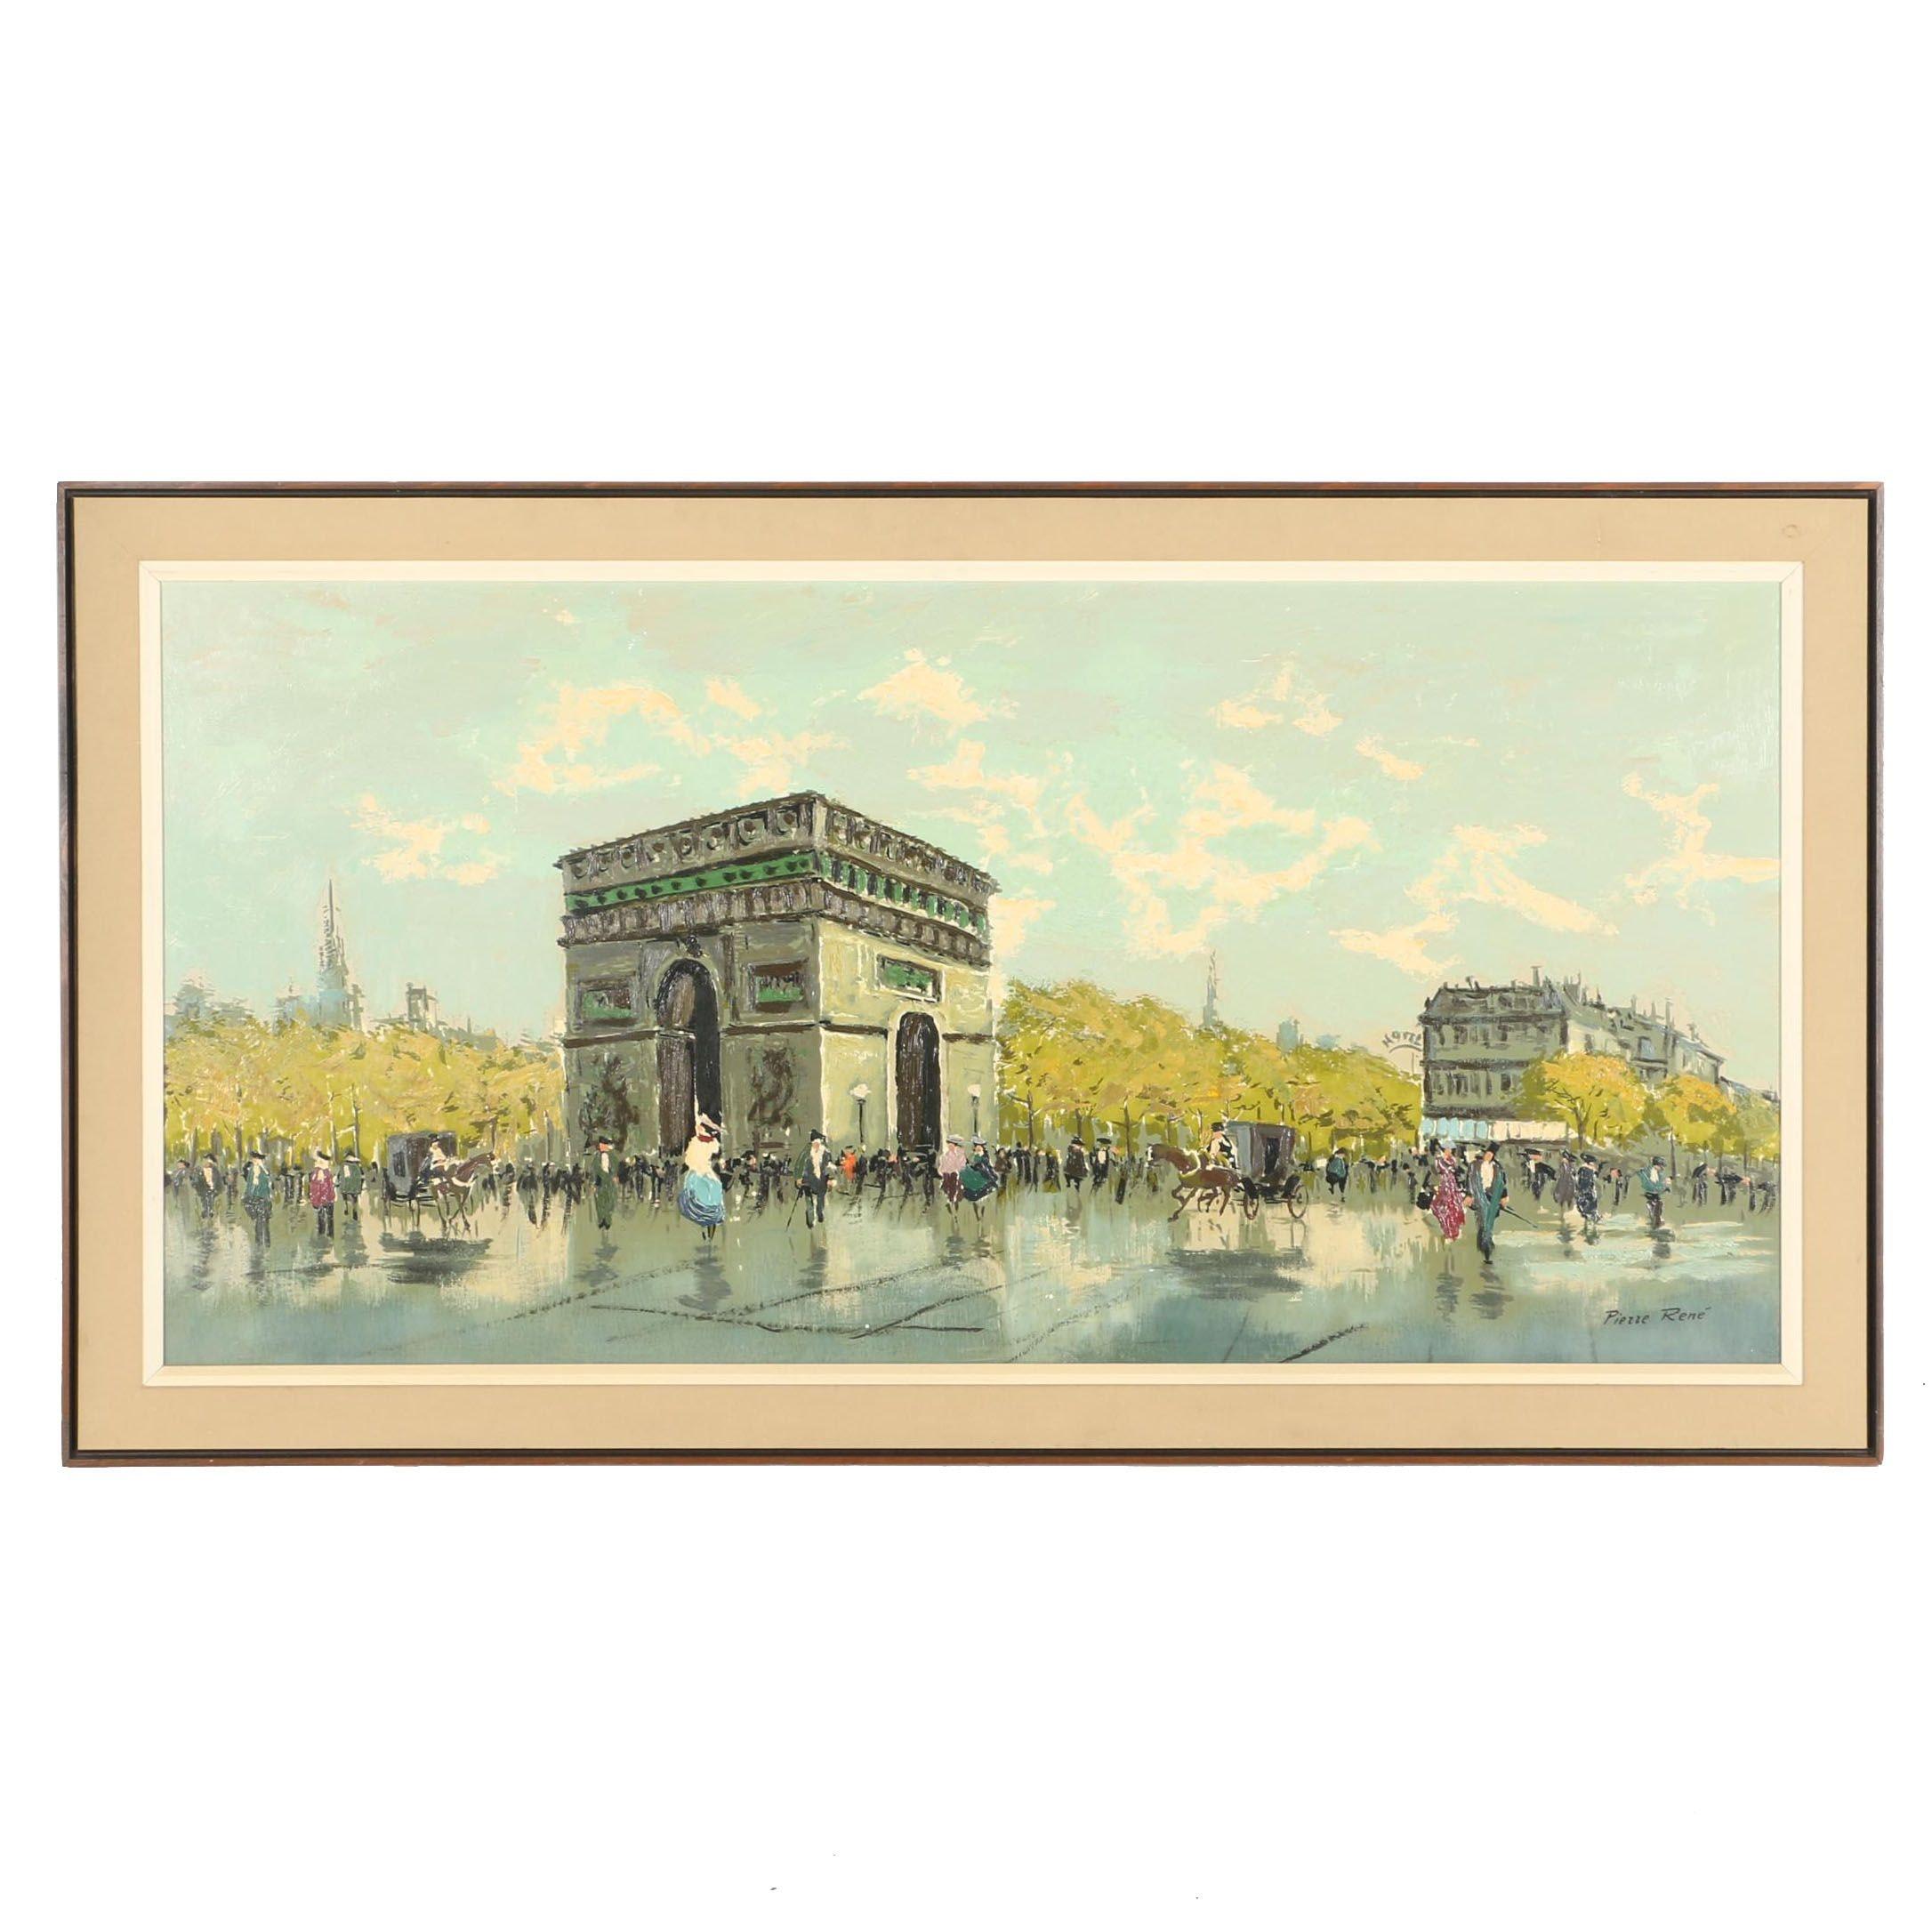 "Pierre Rene Signed Original Oil Painting ""Arc de Triumph"""